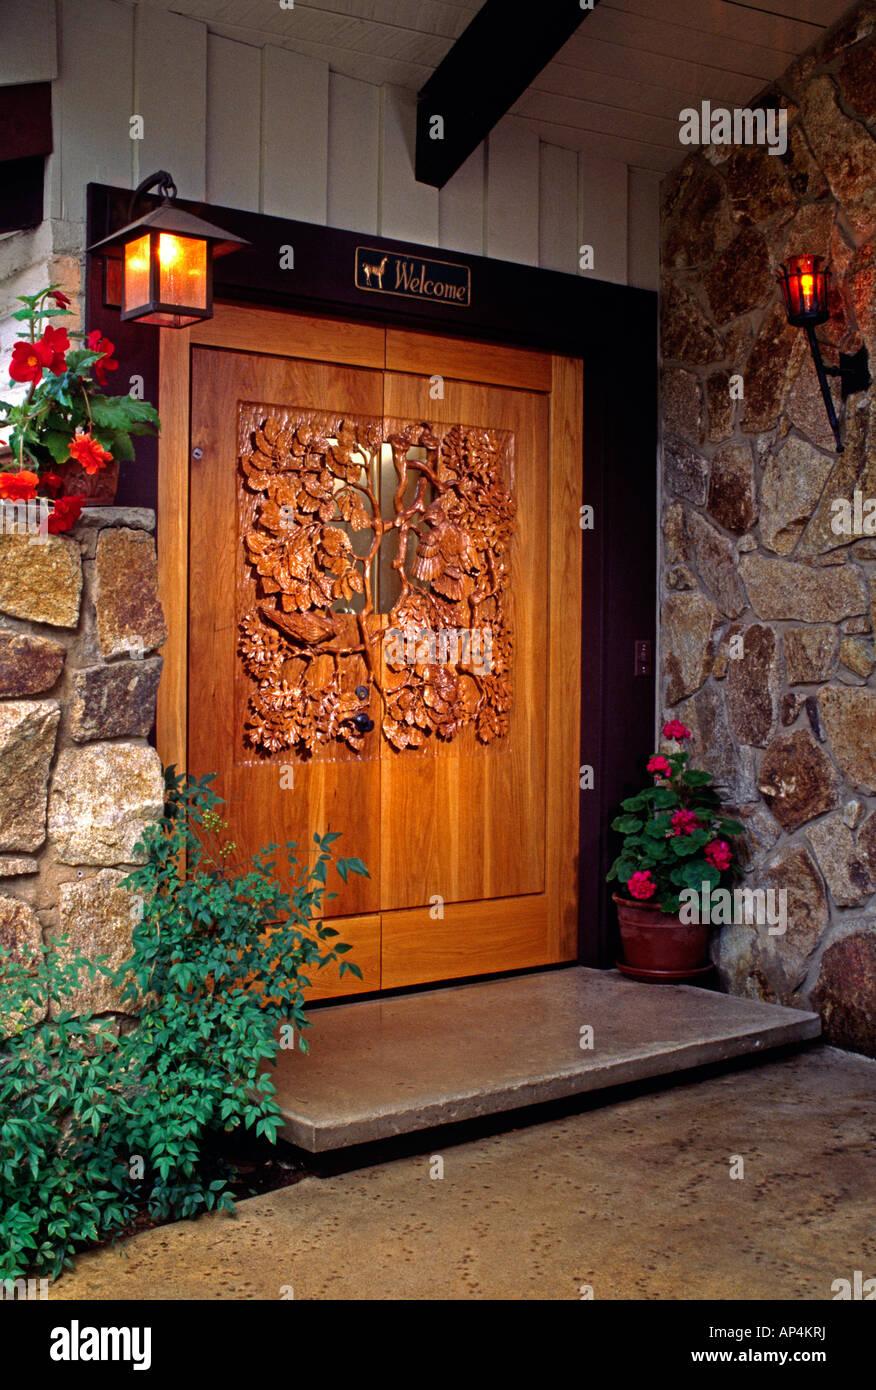 Hand carved WOODEN DOORS of STELLAR JAYS IN OAK TREE by the artist WILLIAM SCHNUTE PR & Hand carved WOODEN DOORS of STELLAR JAYS IN OAK TREE by the artist ...